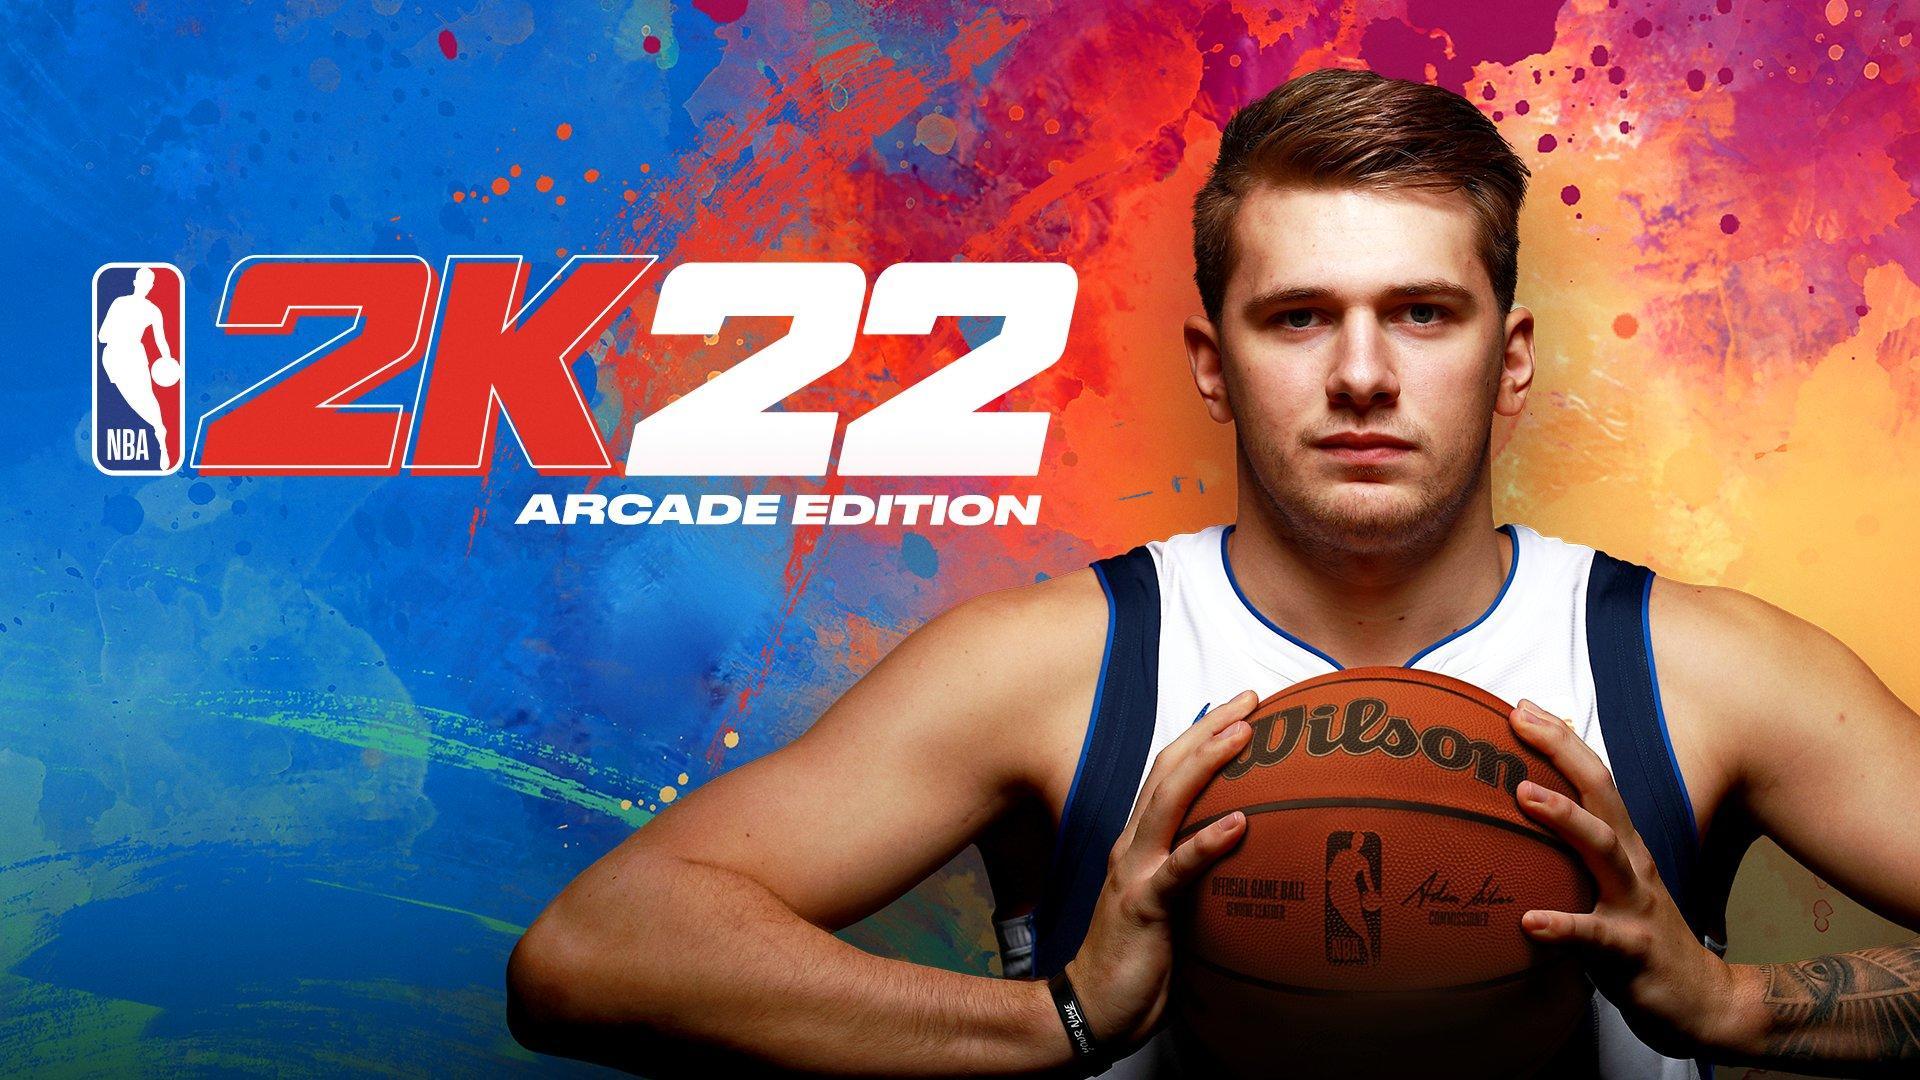 nba-2k22-arcade-edition